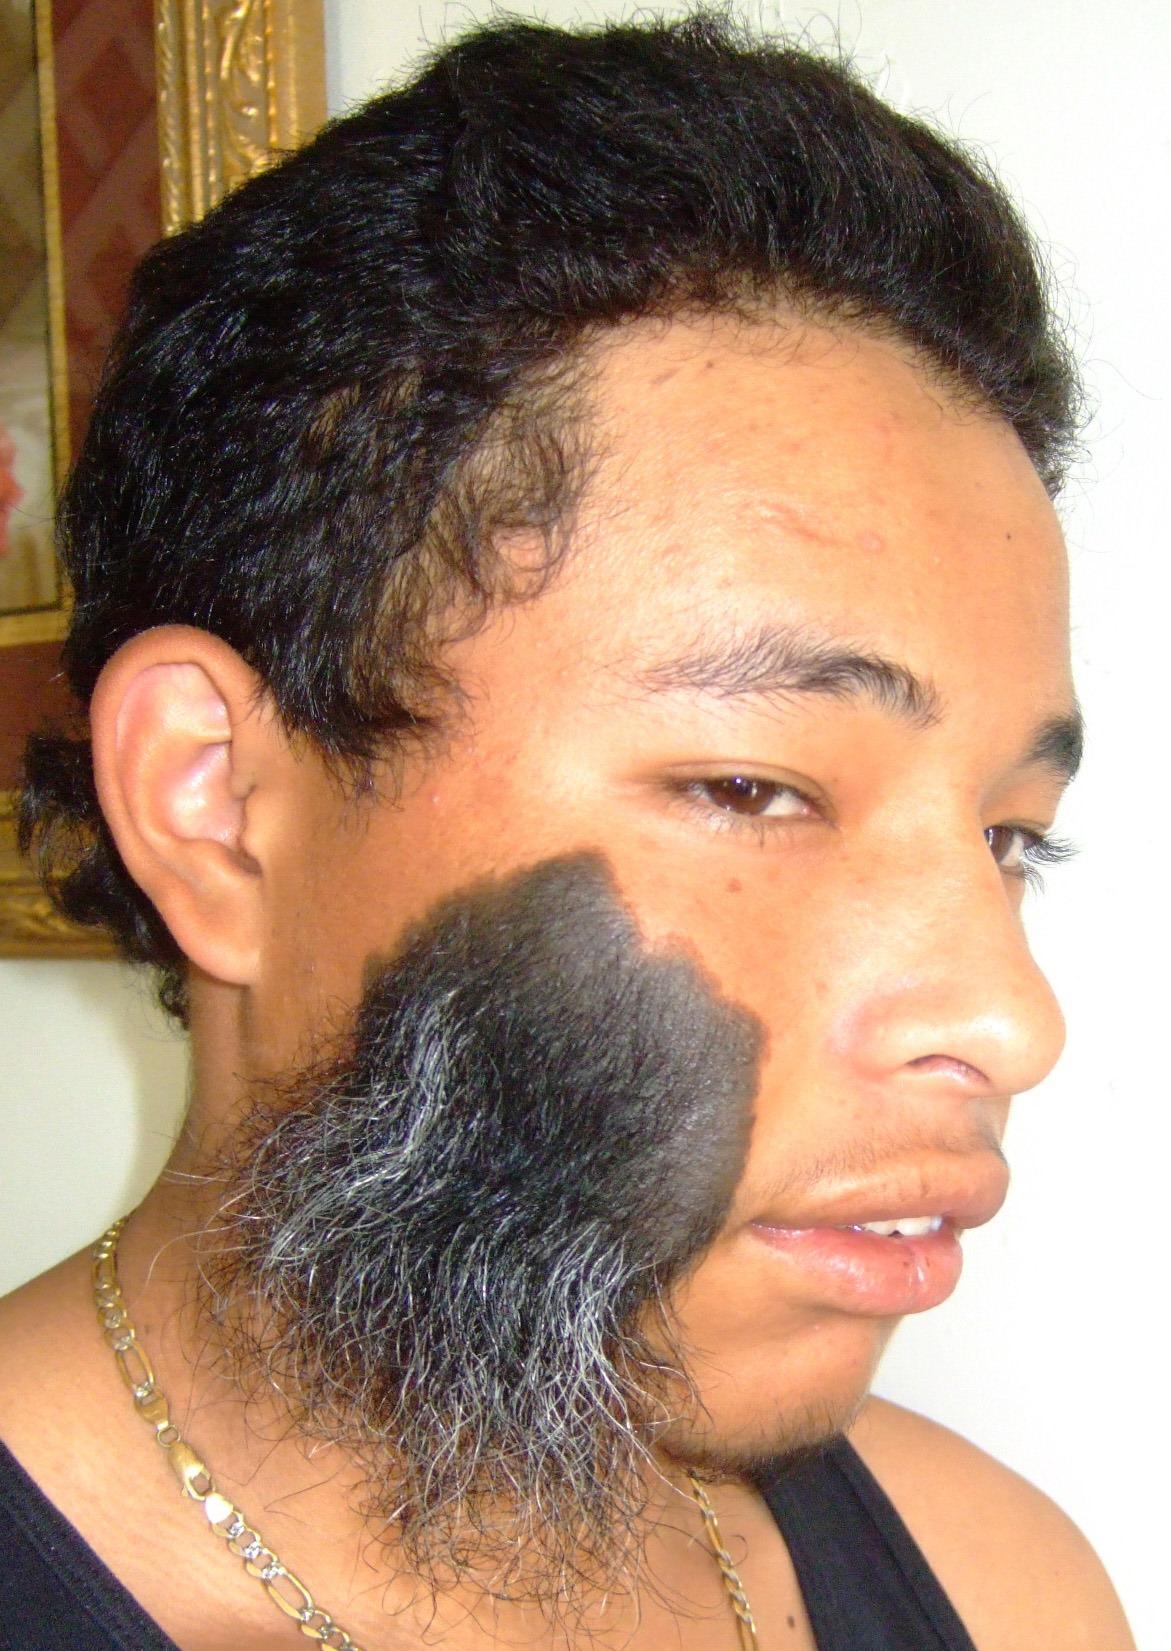 Hairy Birthmarks 97